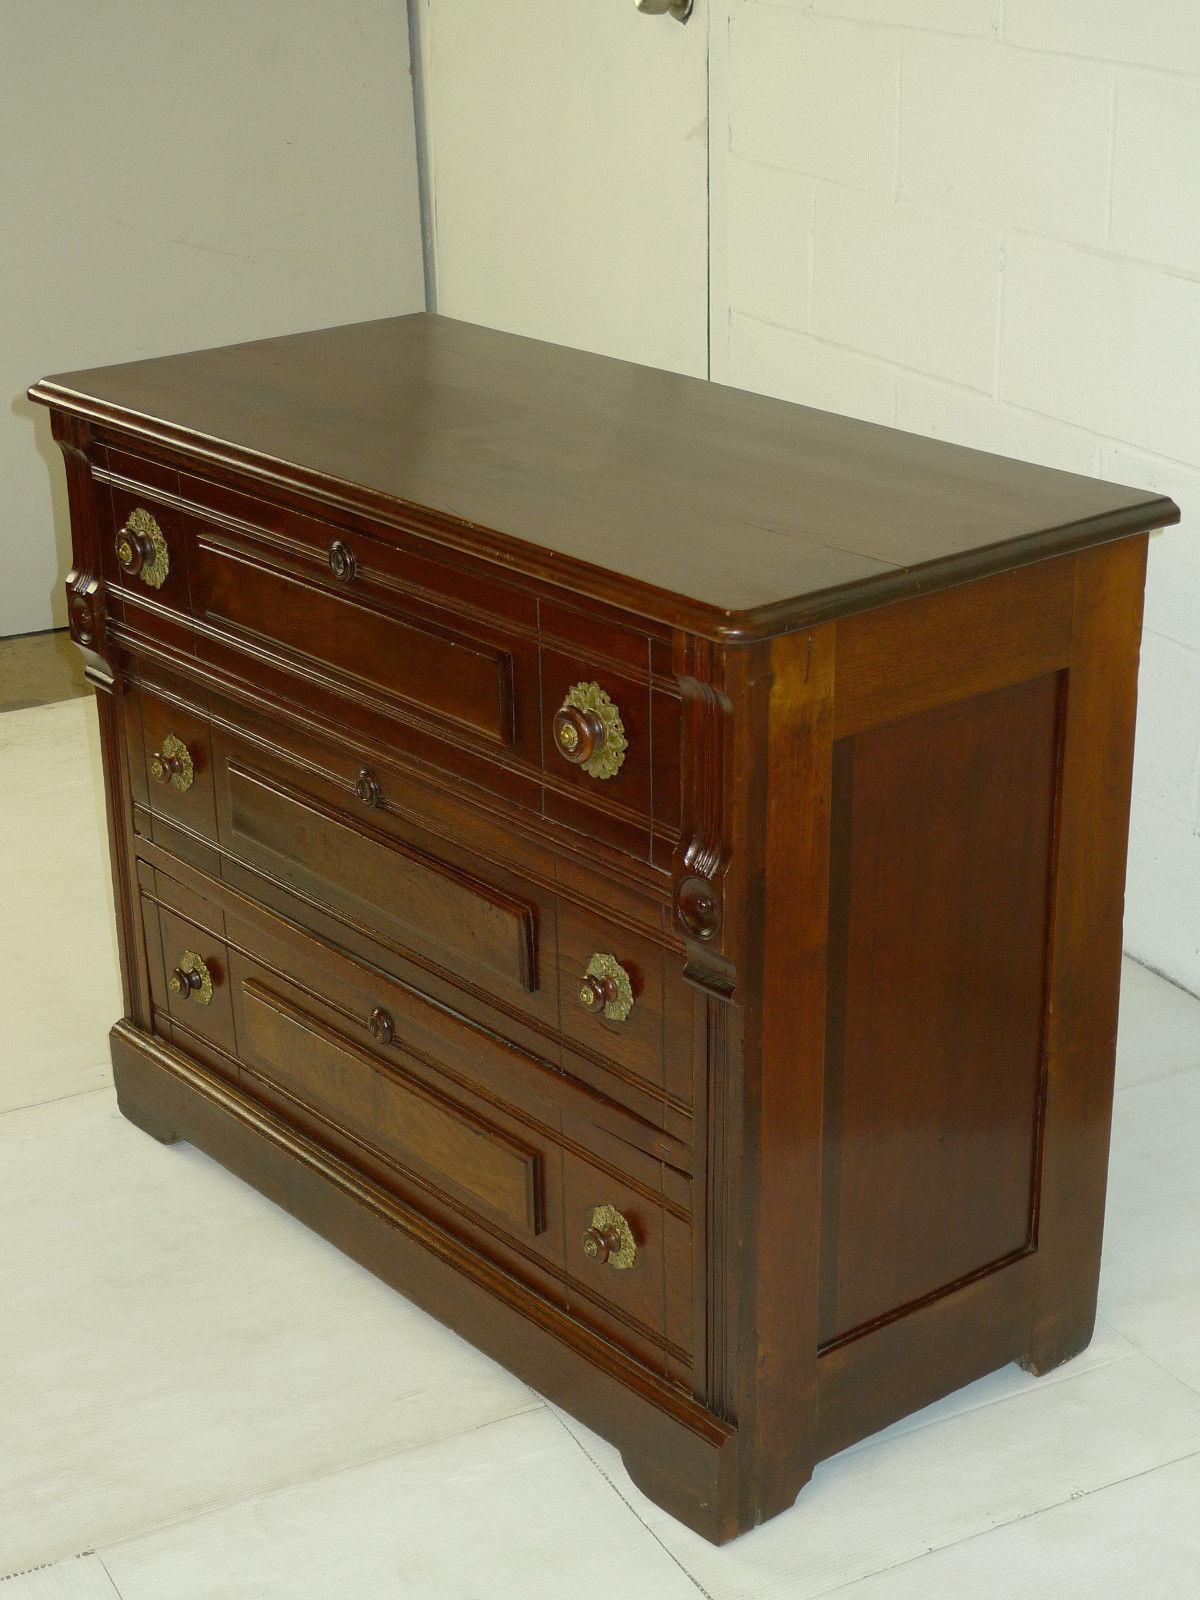 Victorian Eastlake Period Walnut Chest Of Drawers Dresser Victorian Eastlake Period Walnut